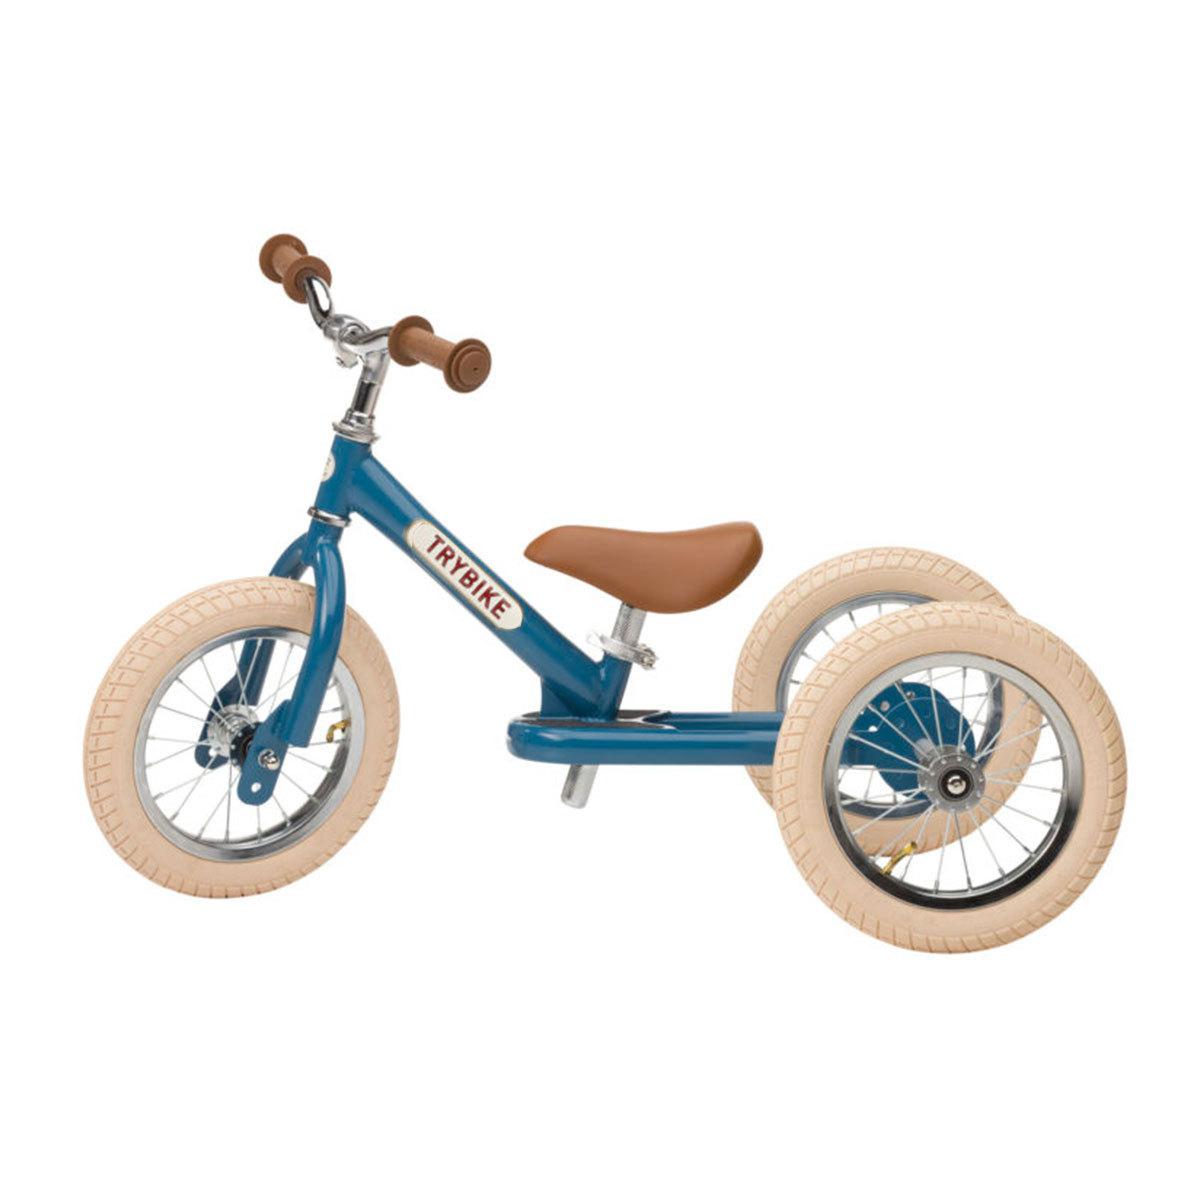 Trotteur & Porteur Trybike 2 en 1 - Vintage Bleu Trybike 2 en 1 - Vintage Bleu